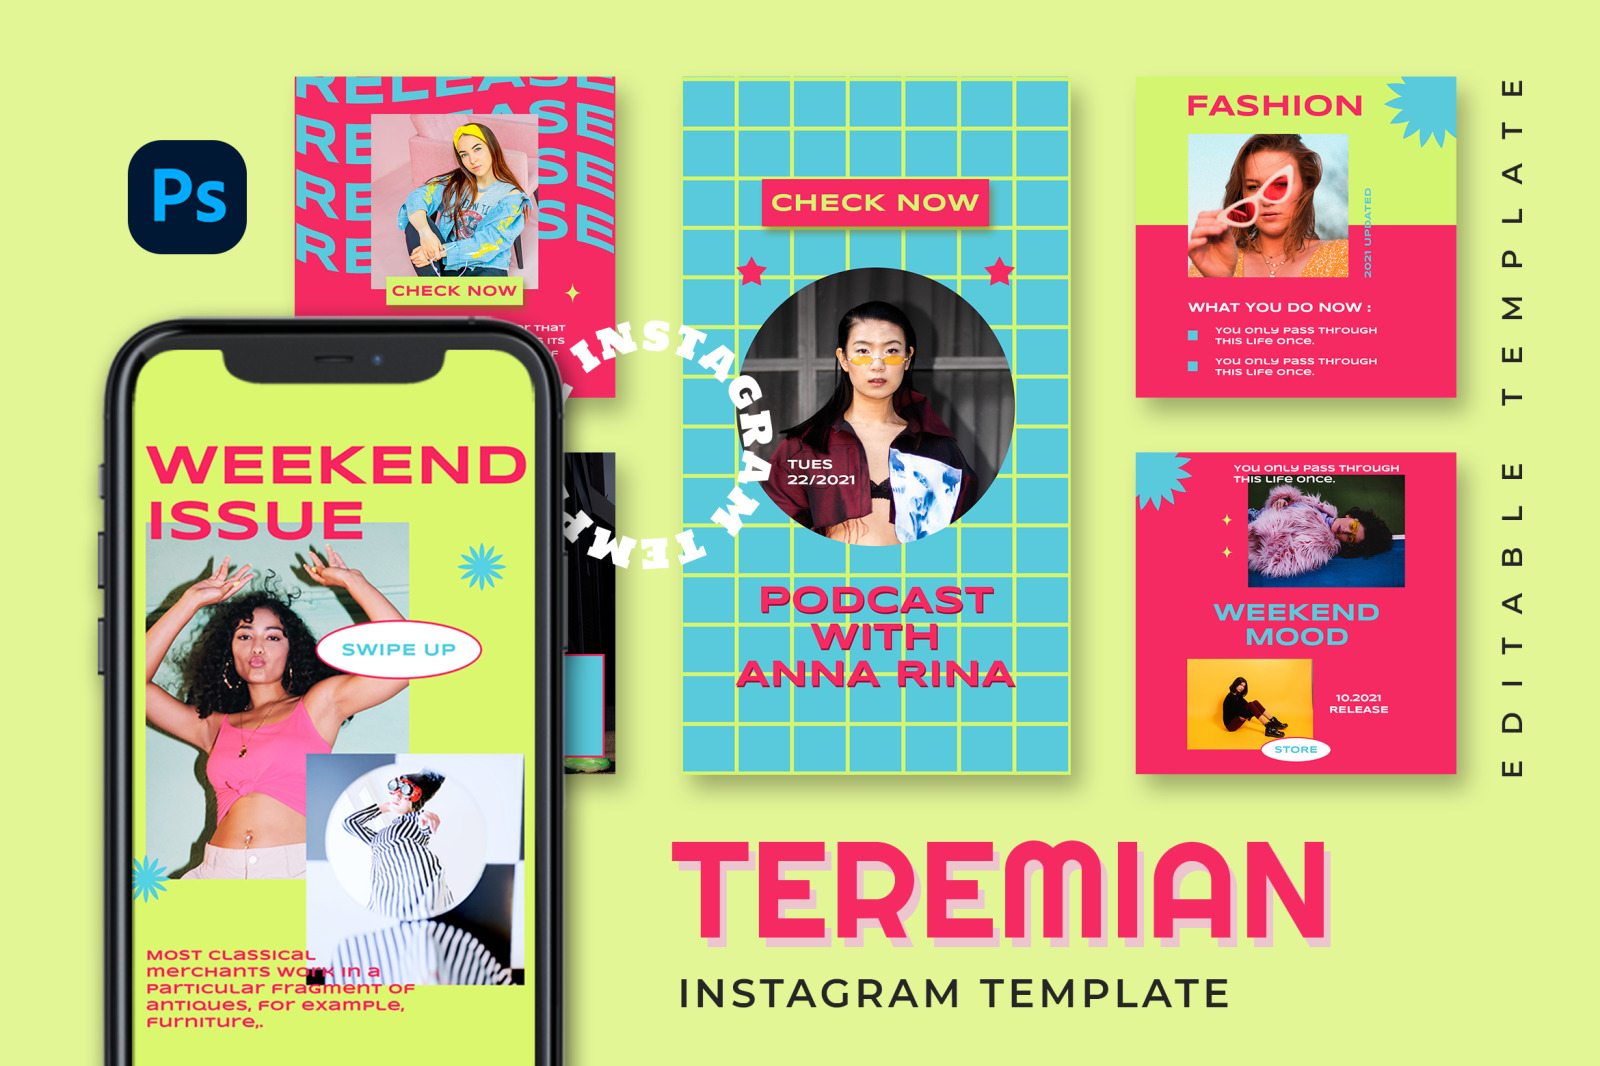 Teremian Instagram Template